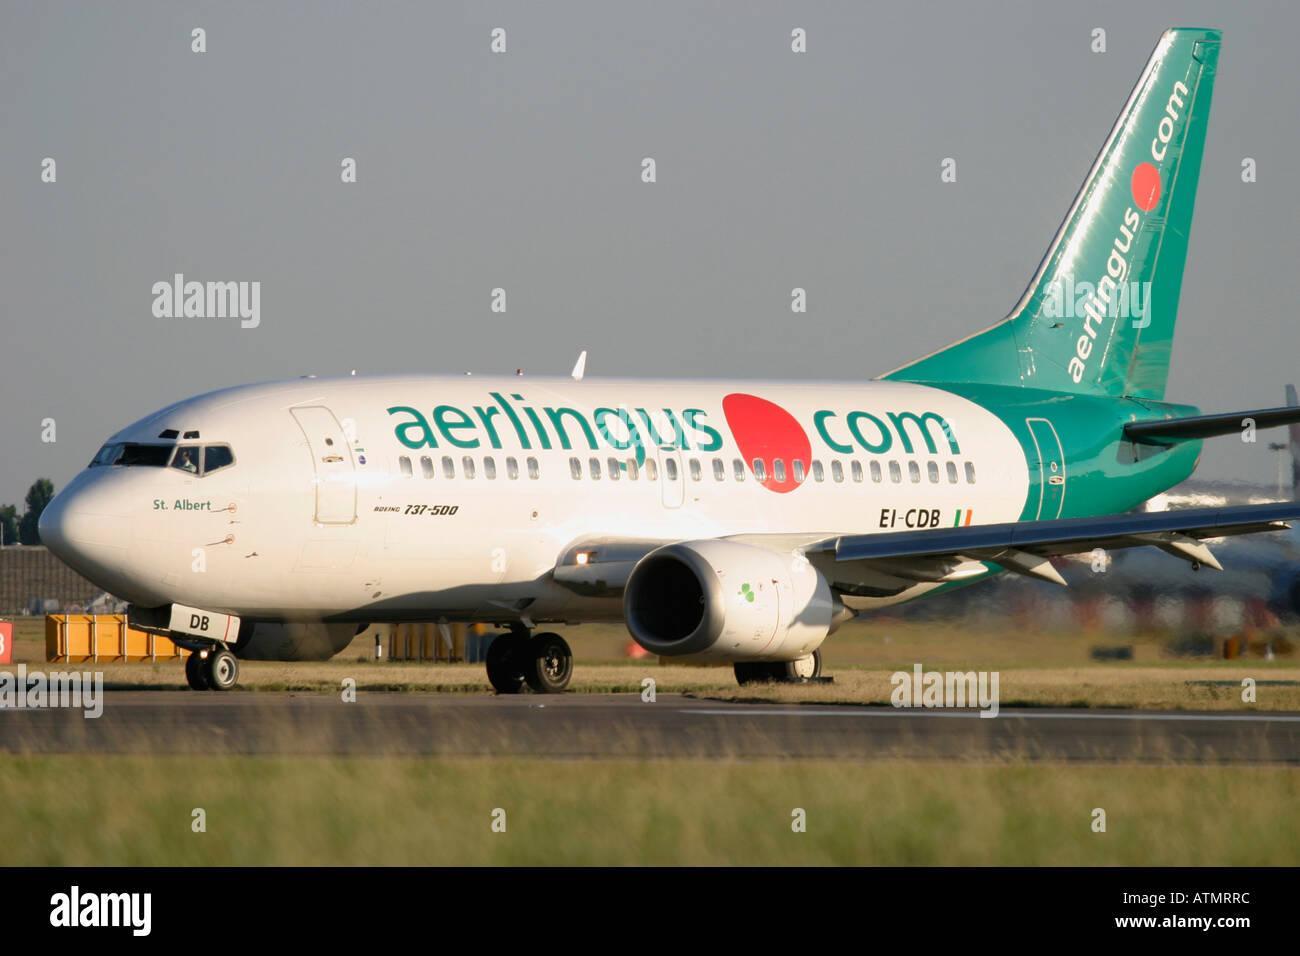 Aer Lingus Boeing 737-548  at London Heathrow Airport - Stock Image